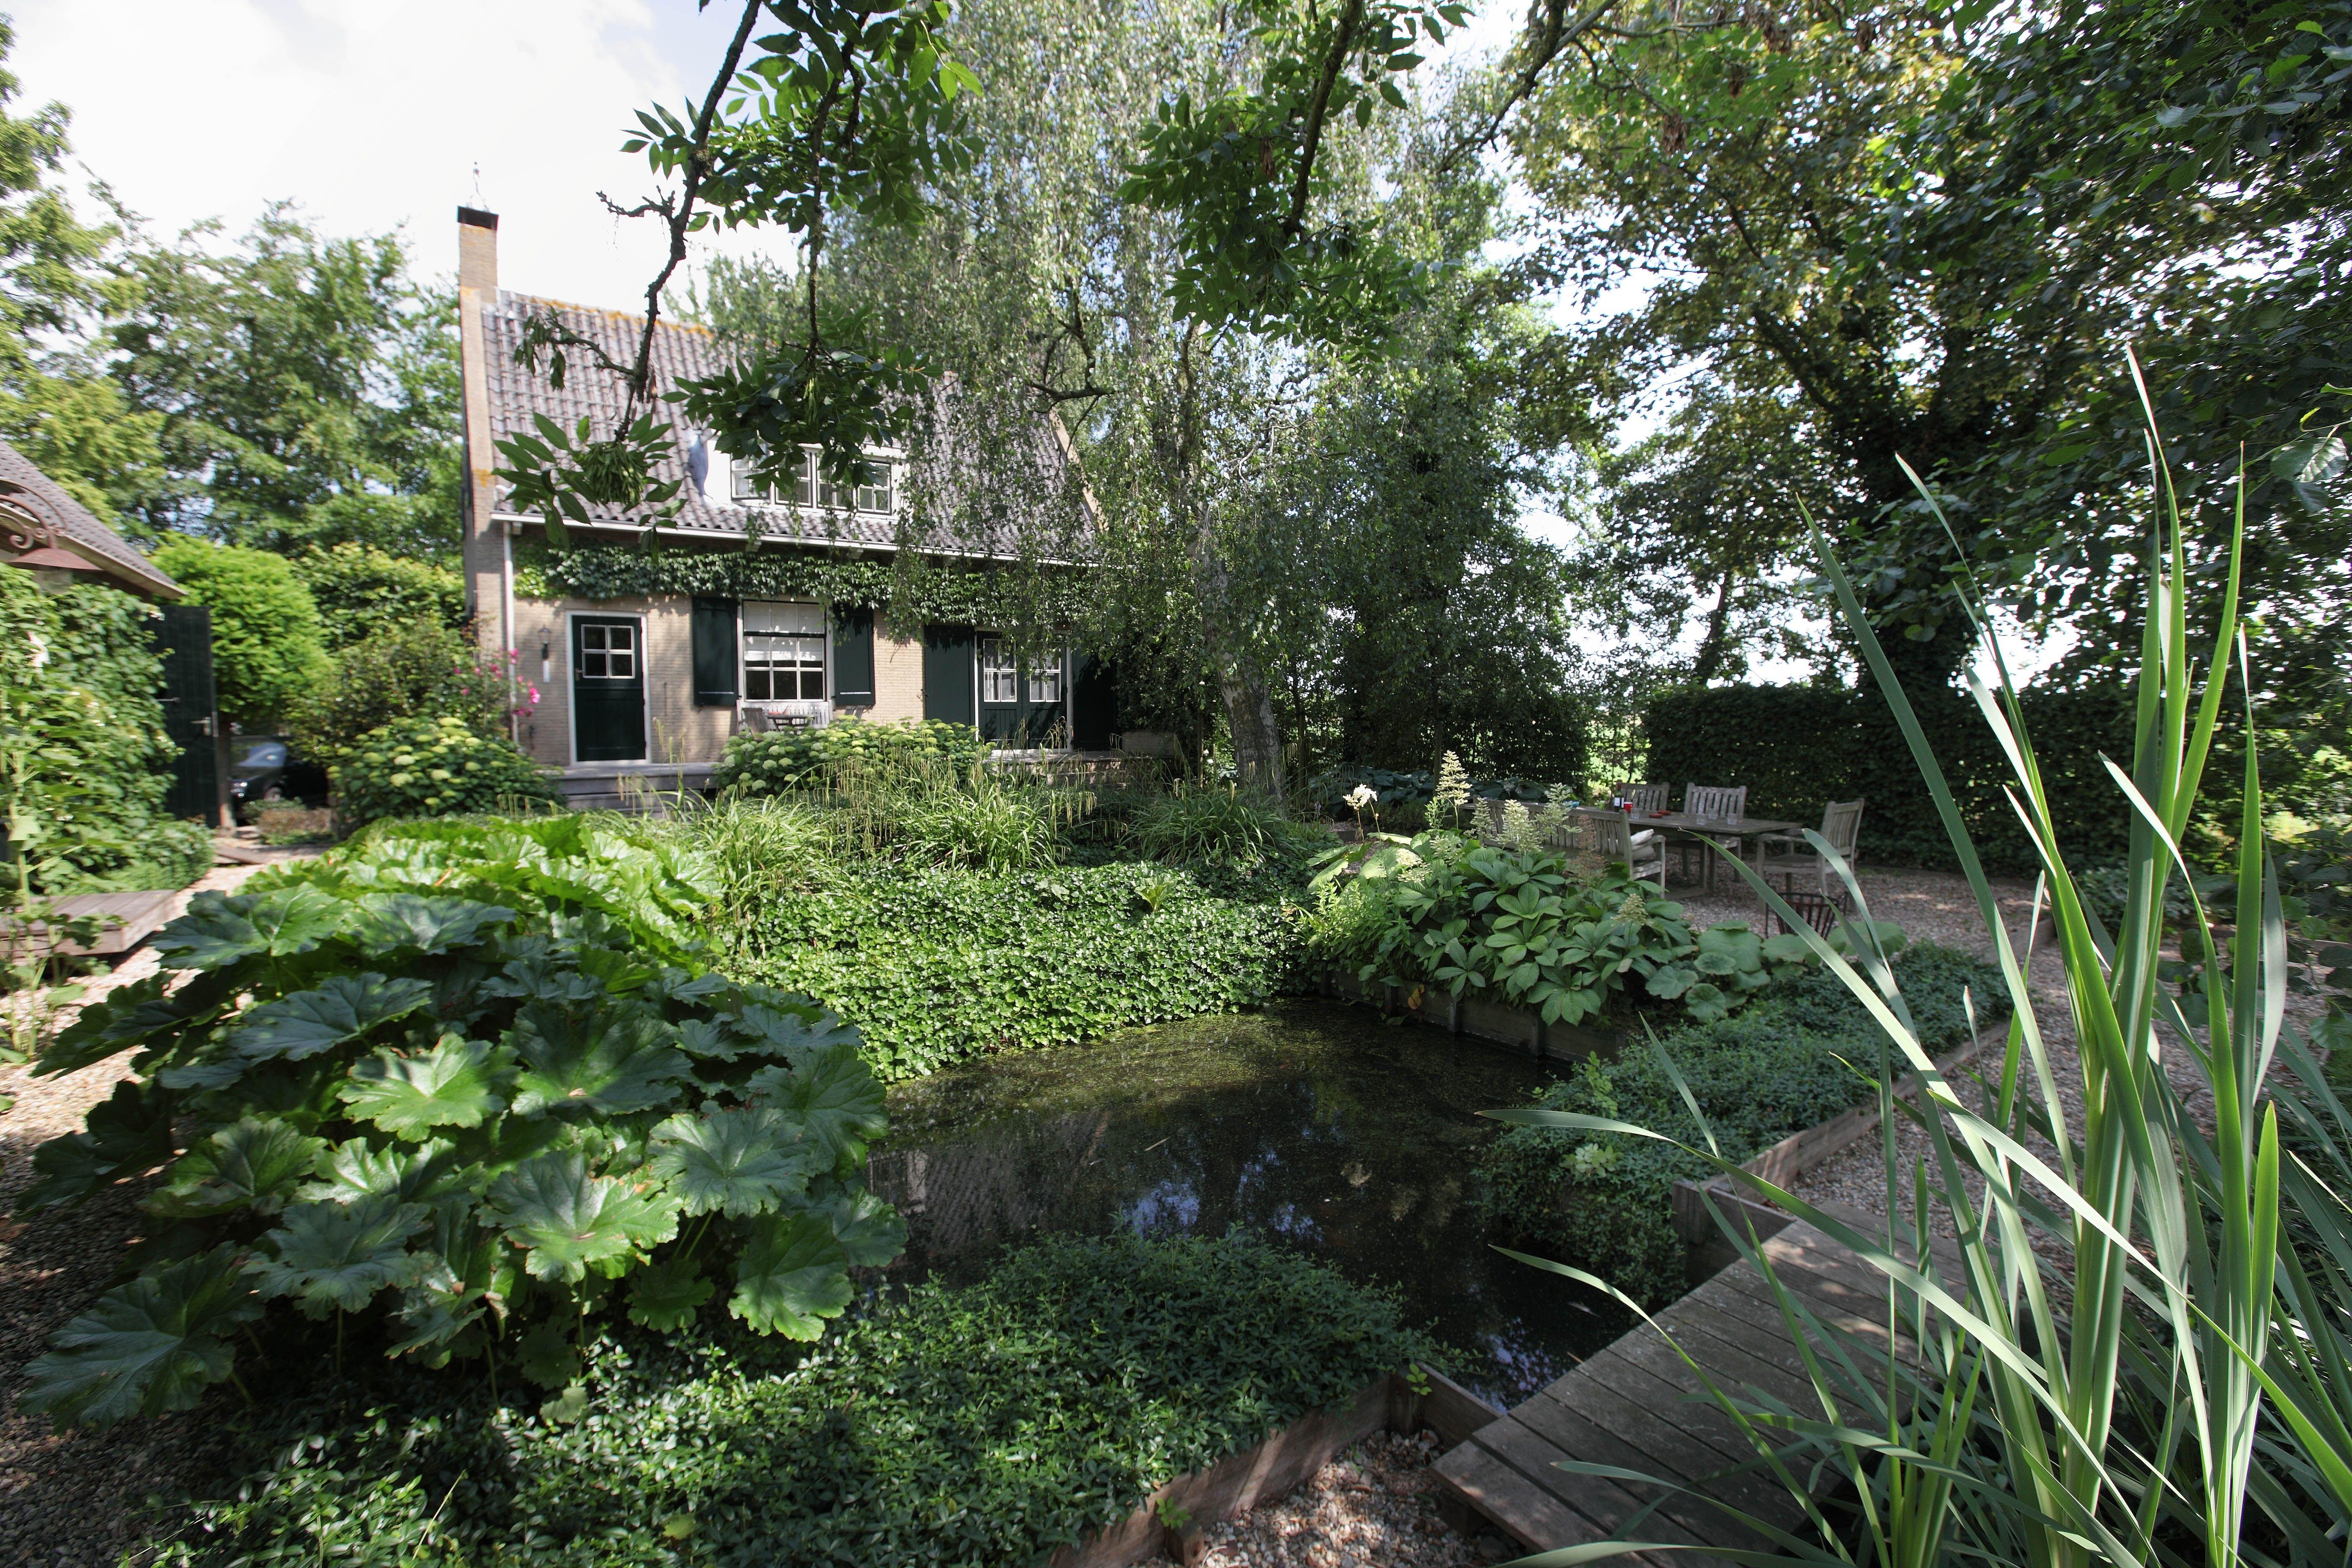 Beplantingsplan Natuurlijke Tuin : Tuin tuinontwerp tuinarchitect hovenier hoveniersbedrijf